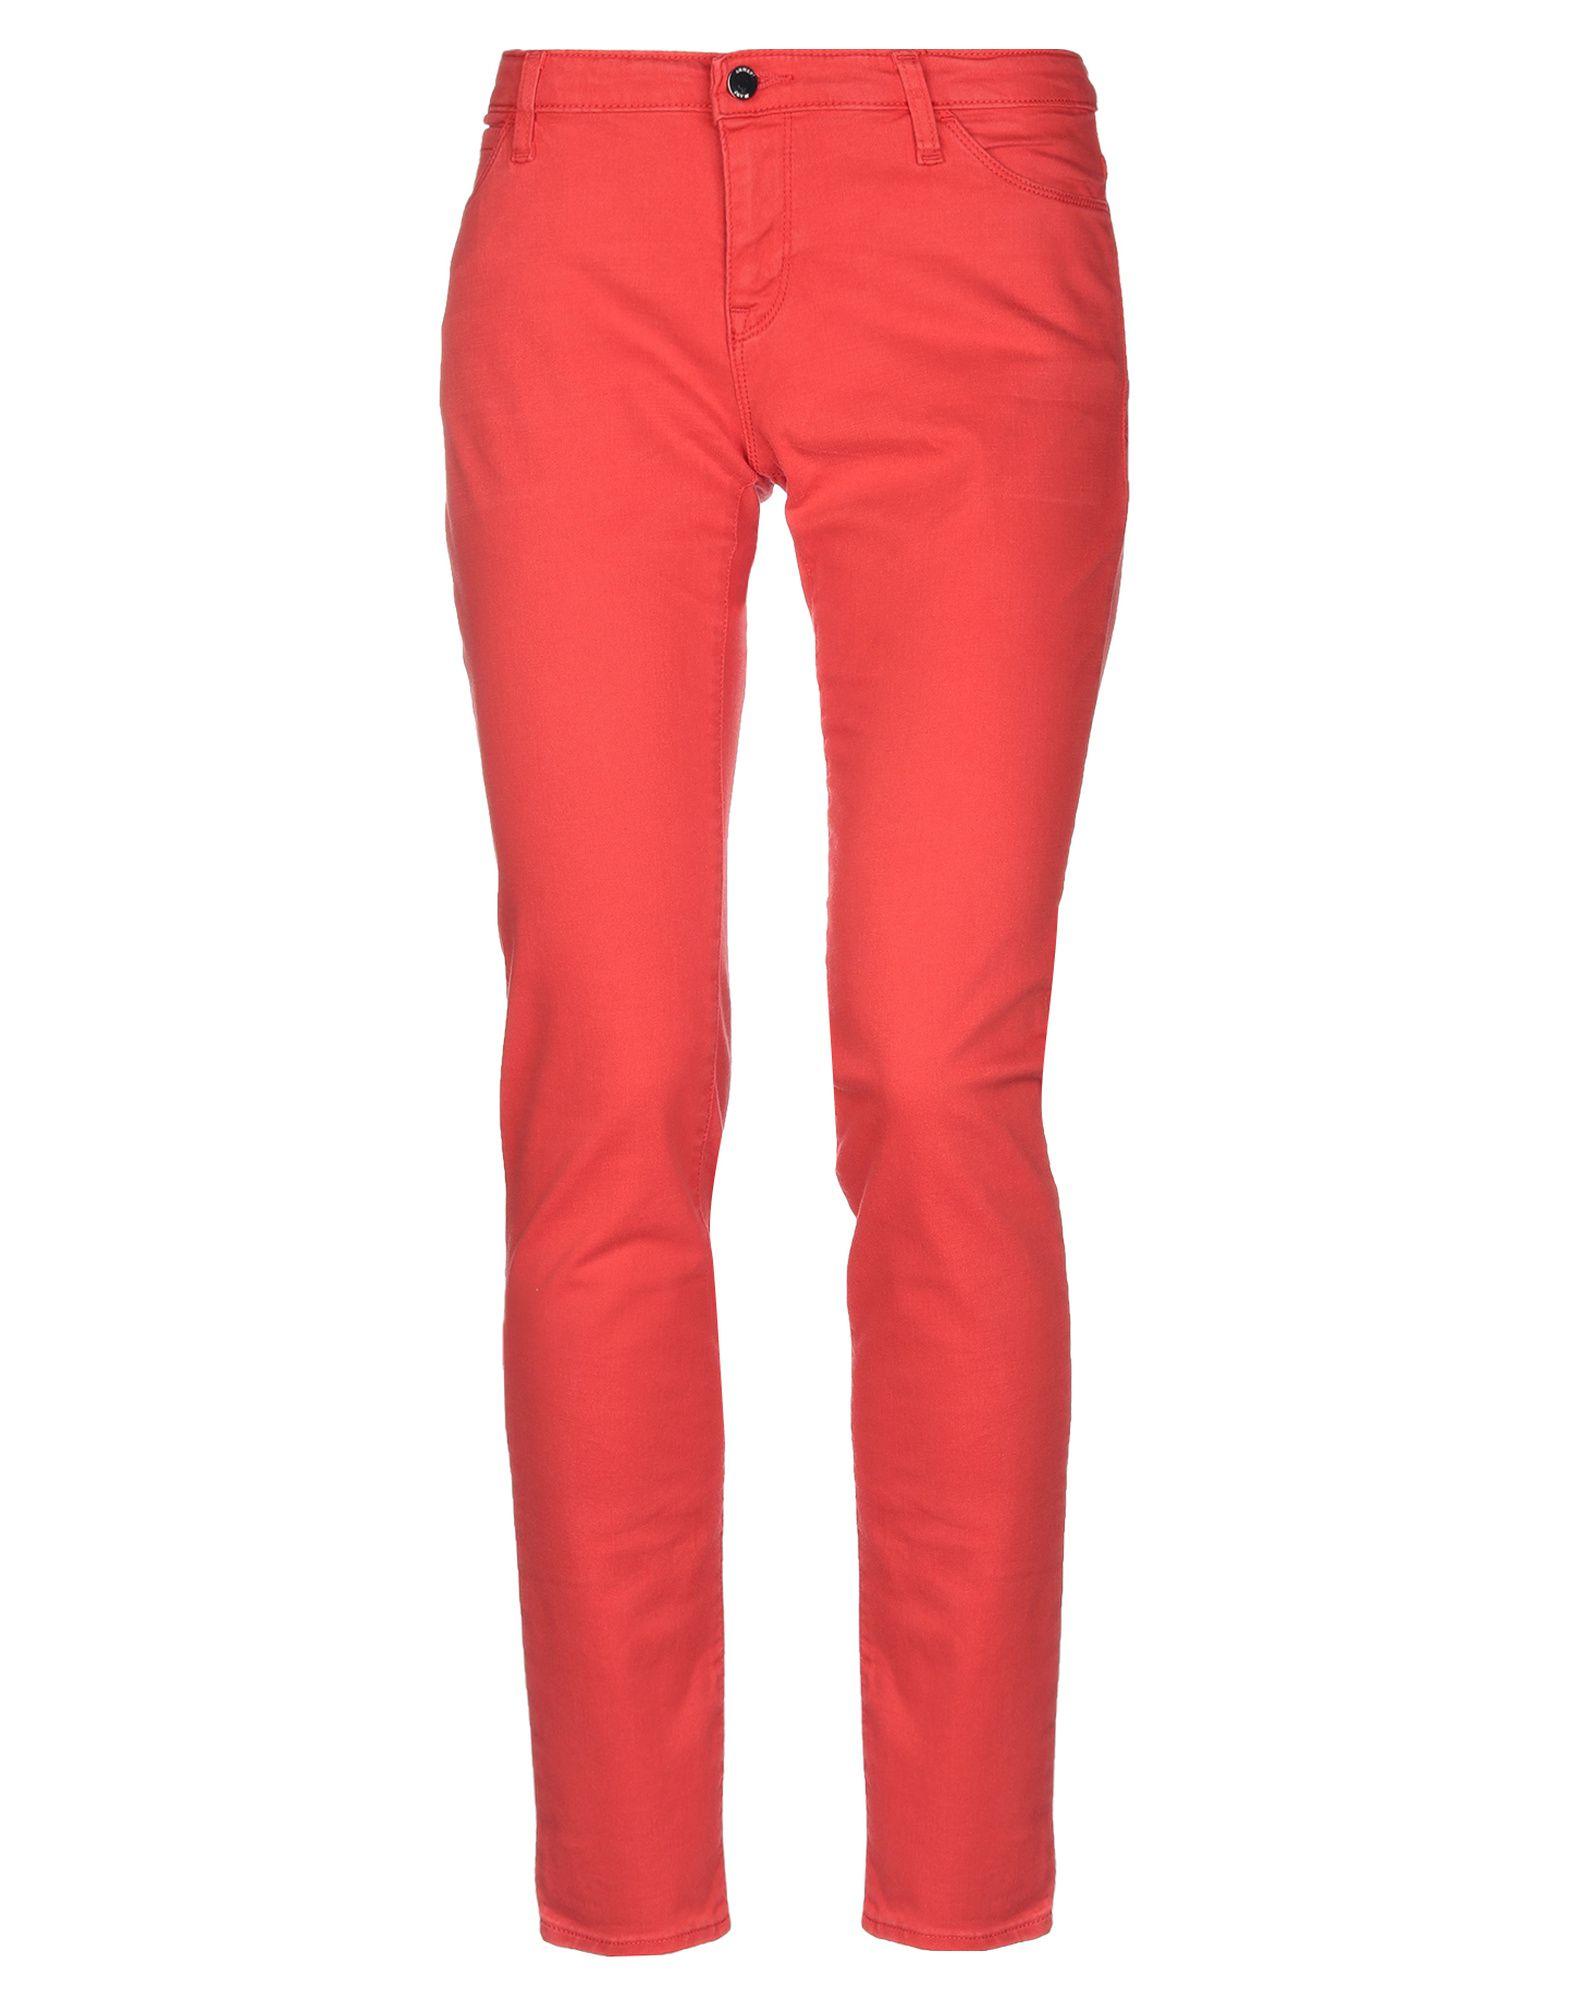 Pantaloni Jeans Armani Jeans donna - - - 42722409QT d48